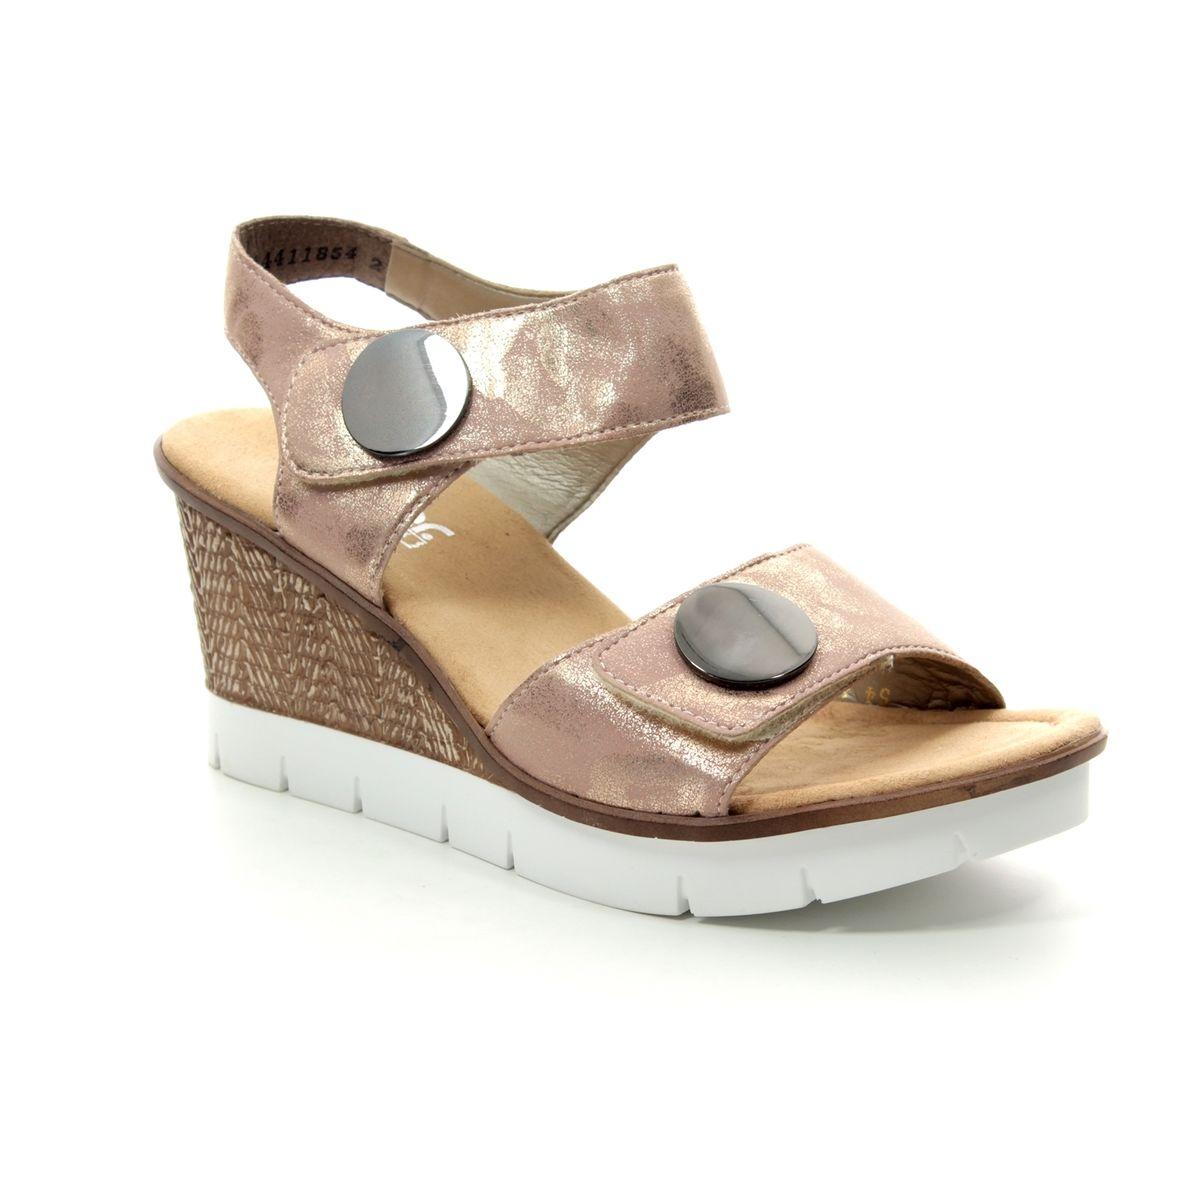 278e417806 Rieker Wedge Sandals - ROSE - 65569-31 ALTON